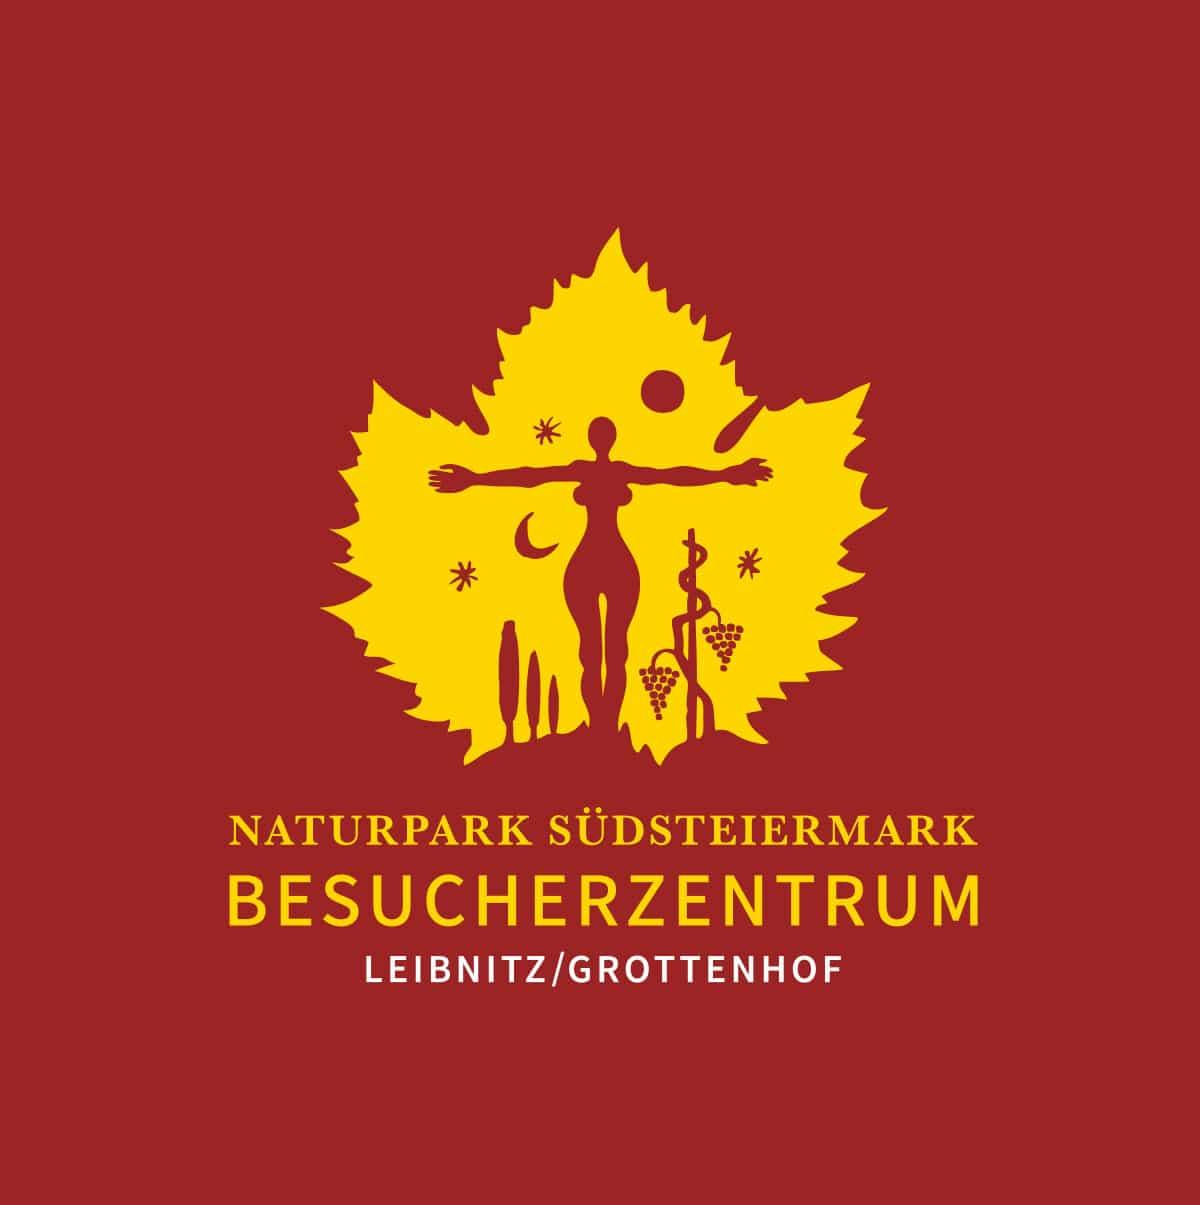 Besucherzentrum Grottenhof – Leibnitz